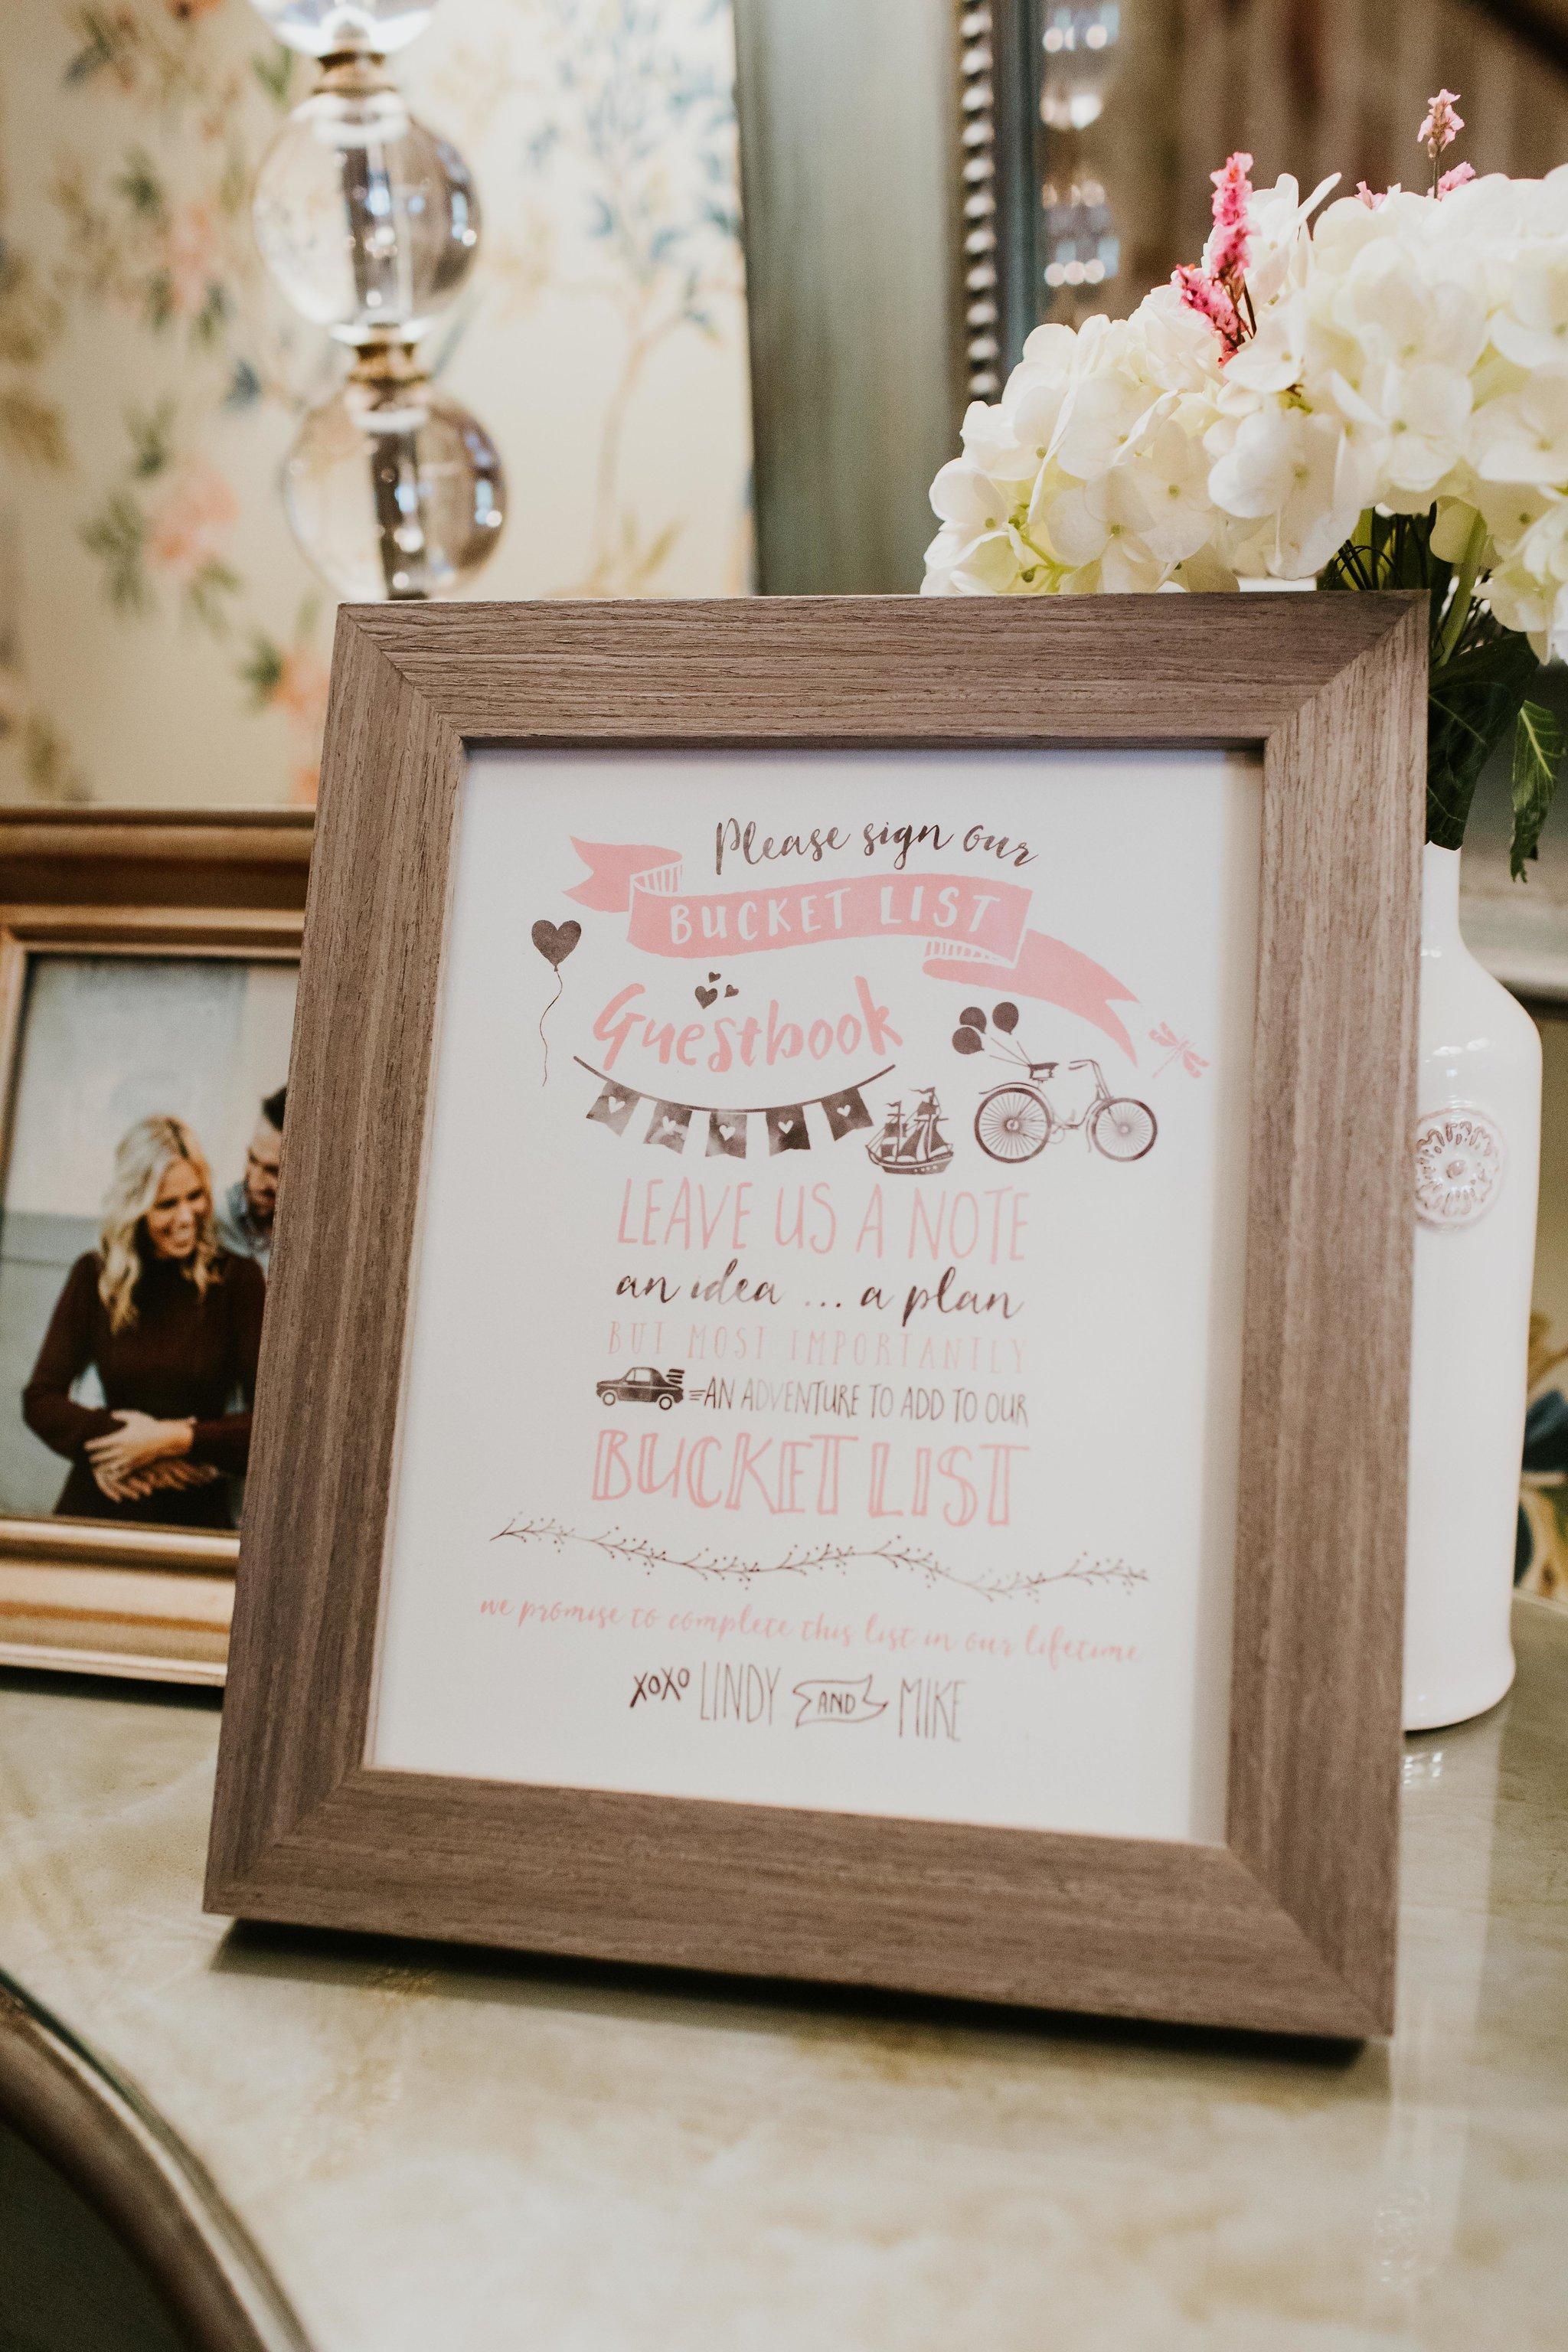 Legare-Waring-House-Charleston-SC-wedding-portrait-photography-413.jpg